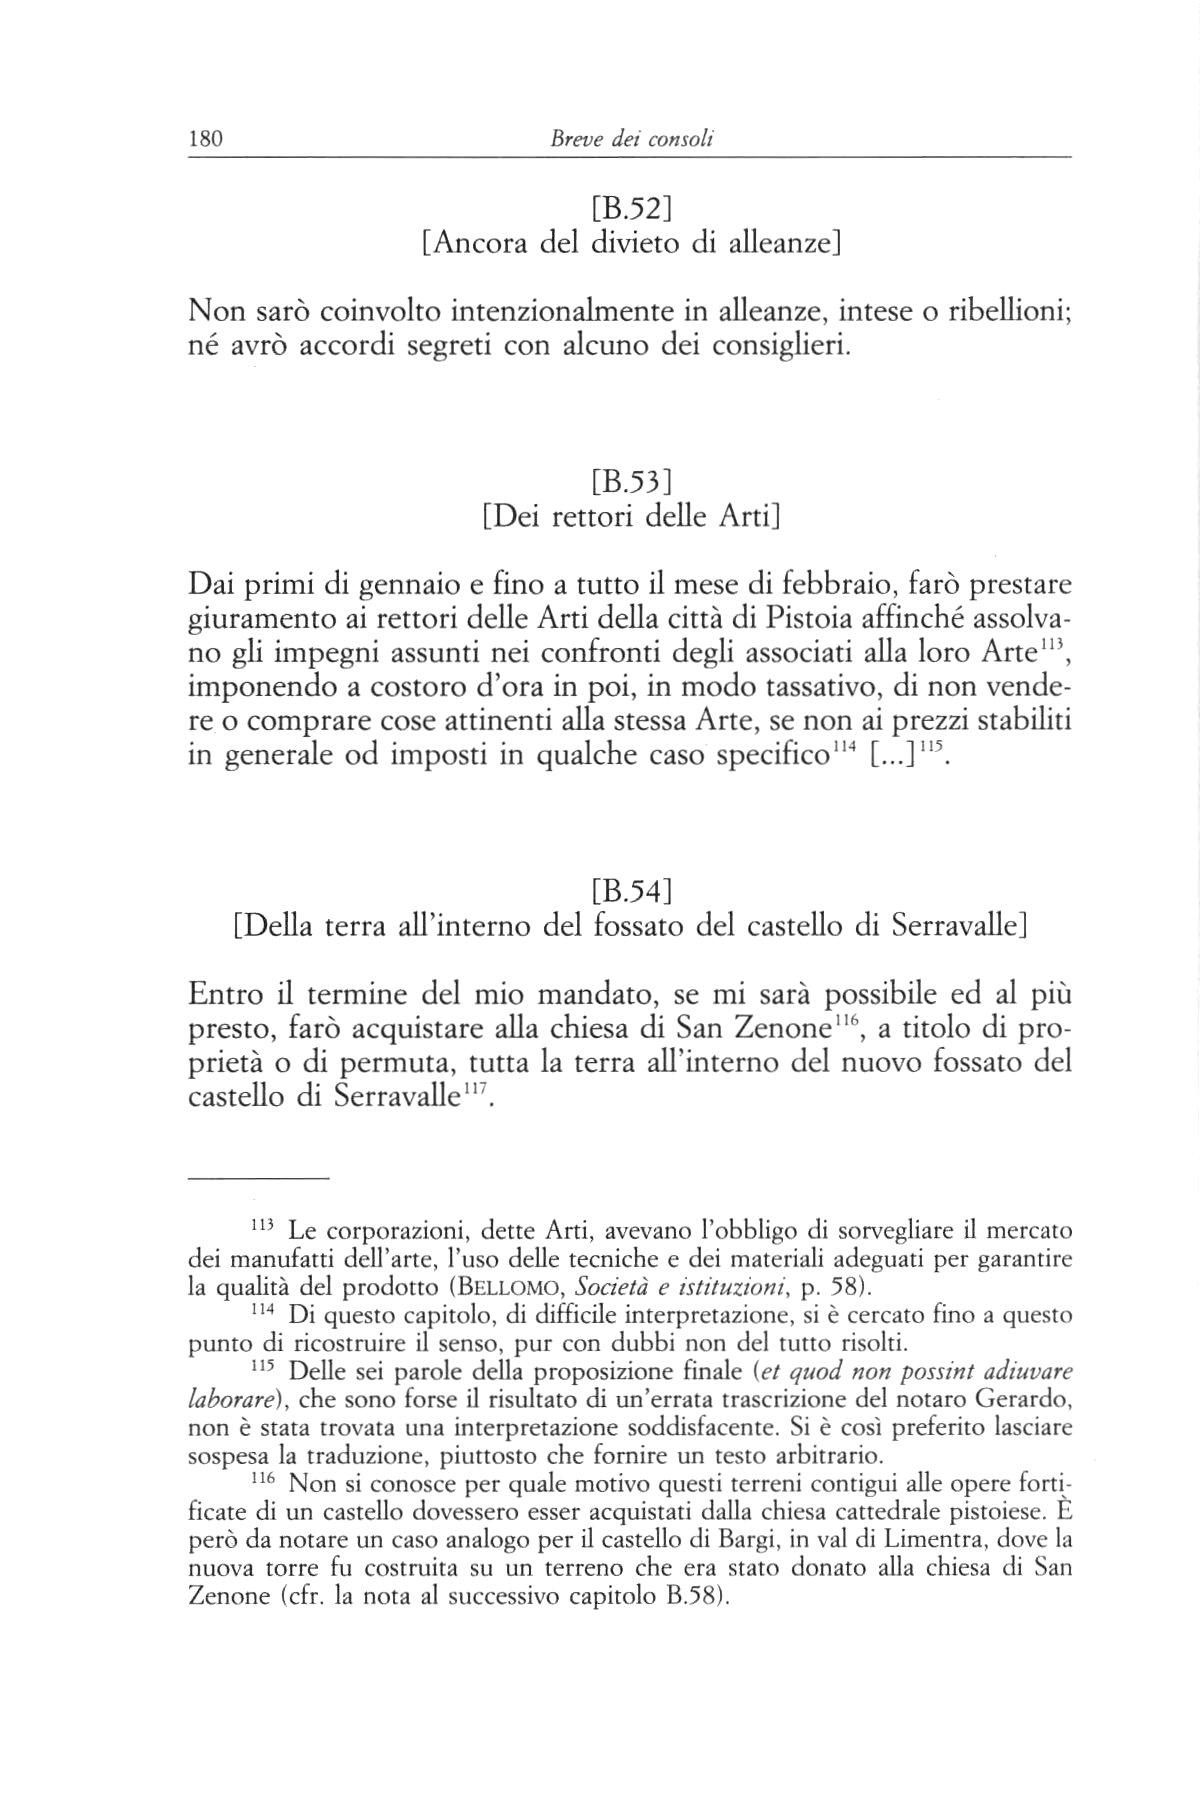 statuti pistoiesi del sec.XII 0180.jpg